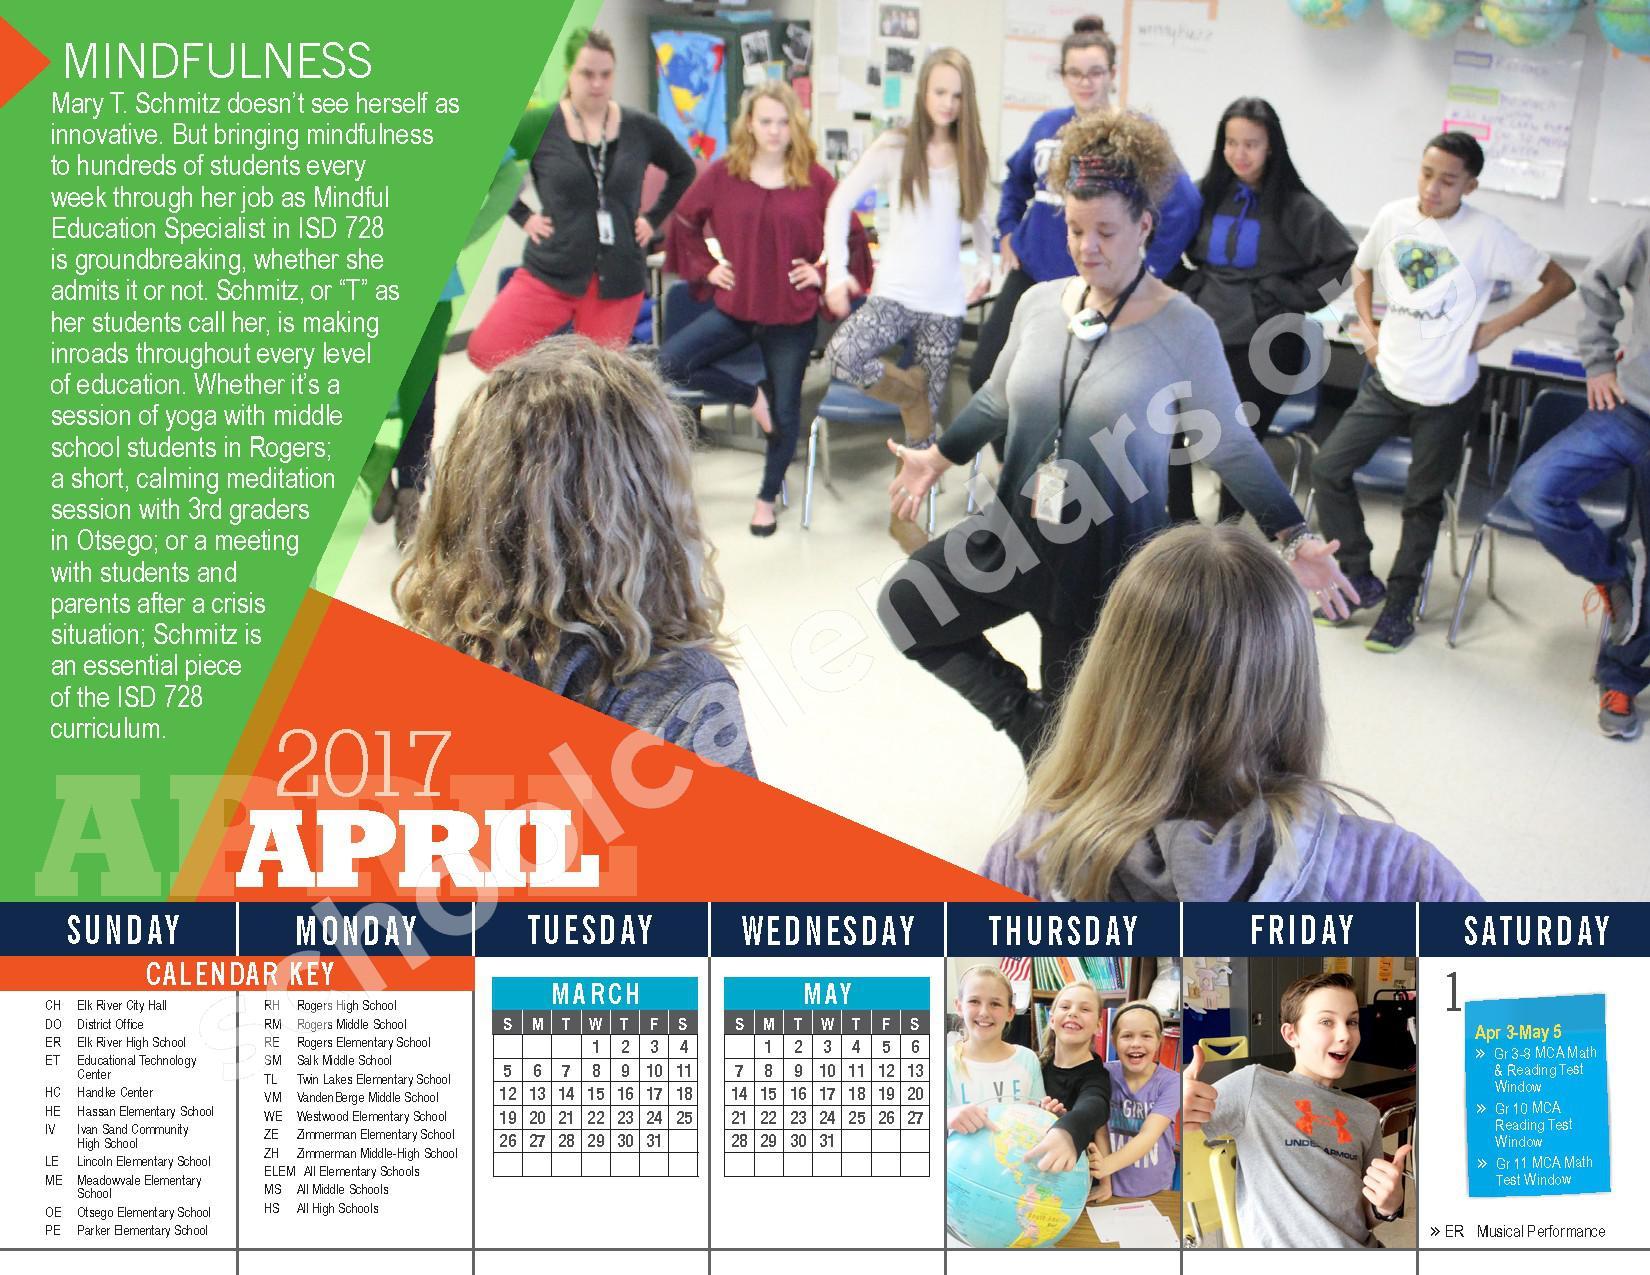 2016 - 2017 District Calendar – Vandenberge Middle School – page 20